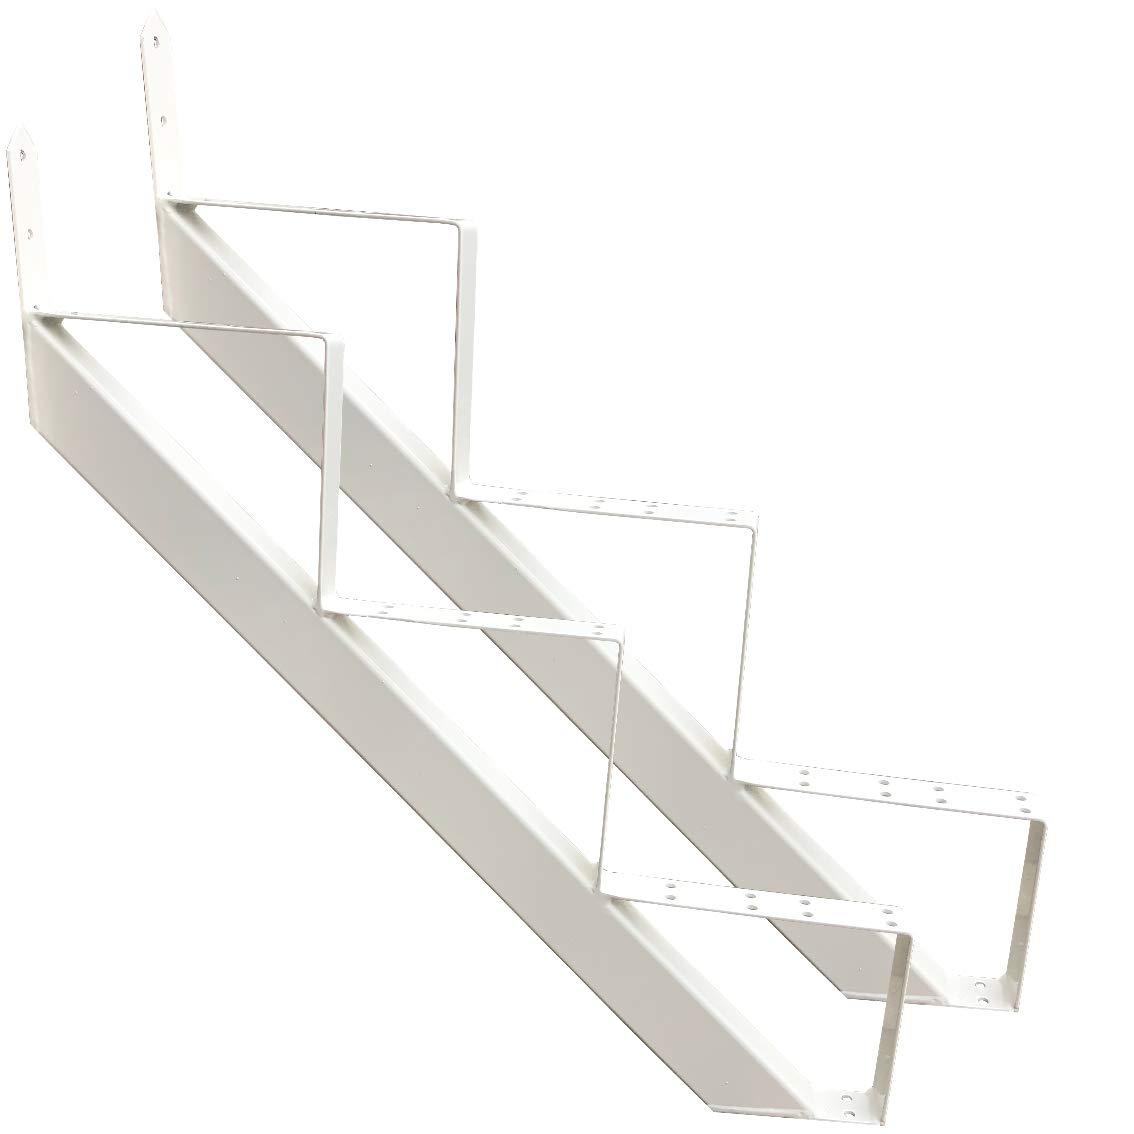 Eck-Glasregal grau Badezimmer-Regal inkl B/ücherregal Glasboden geschwungen Regalset 32 x 32 cm x 6 mm Tr/äger